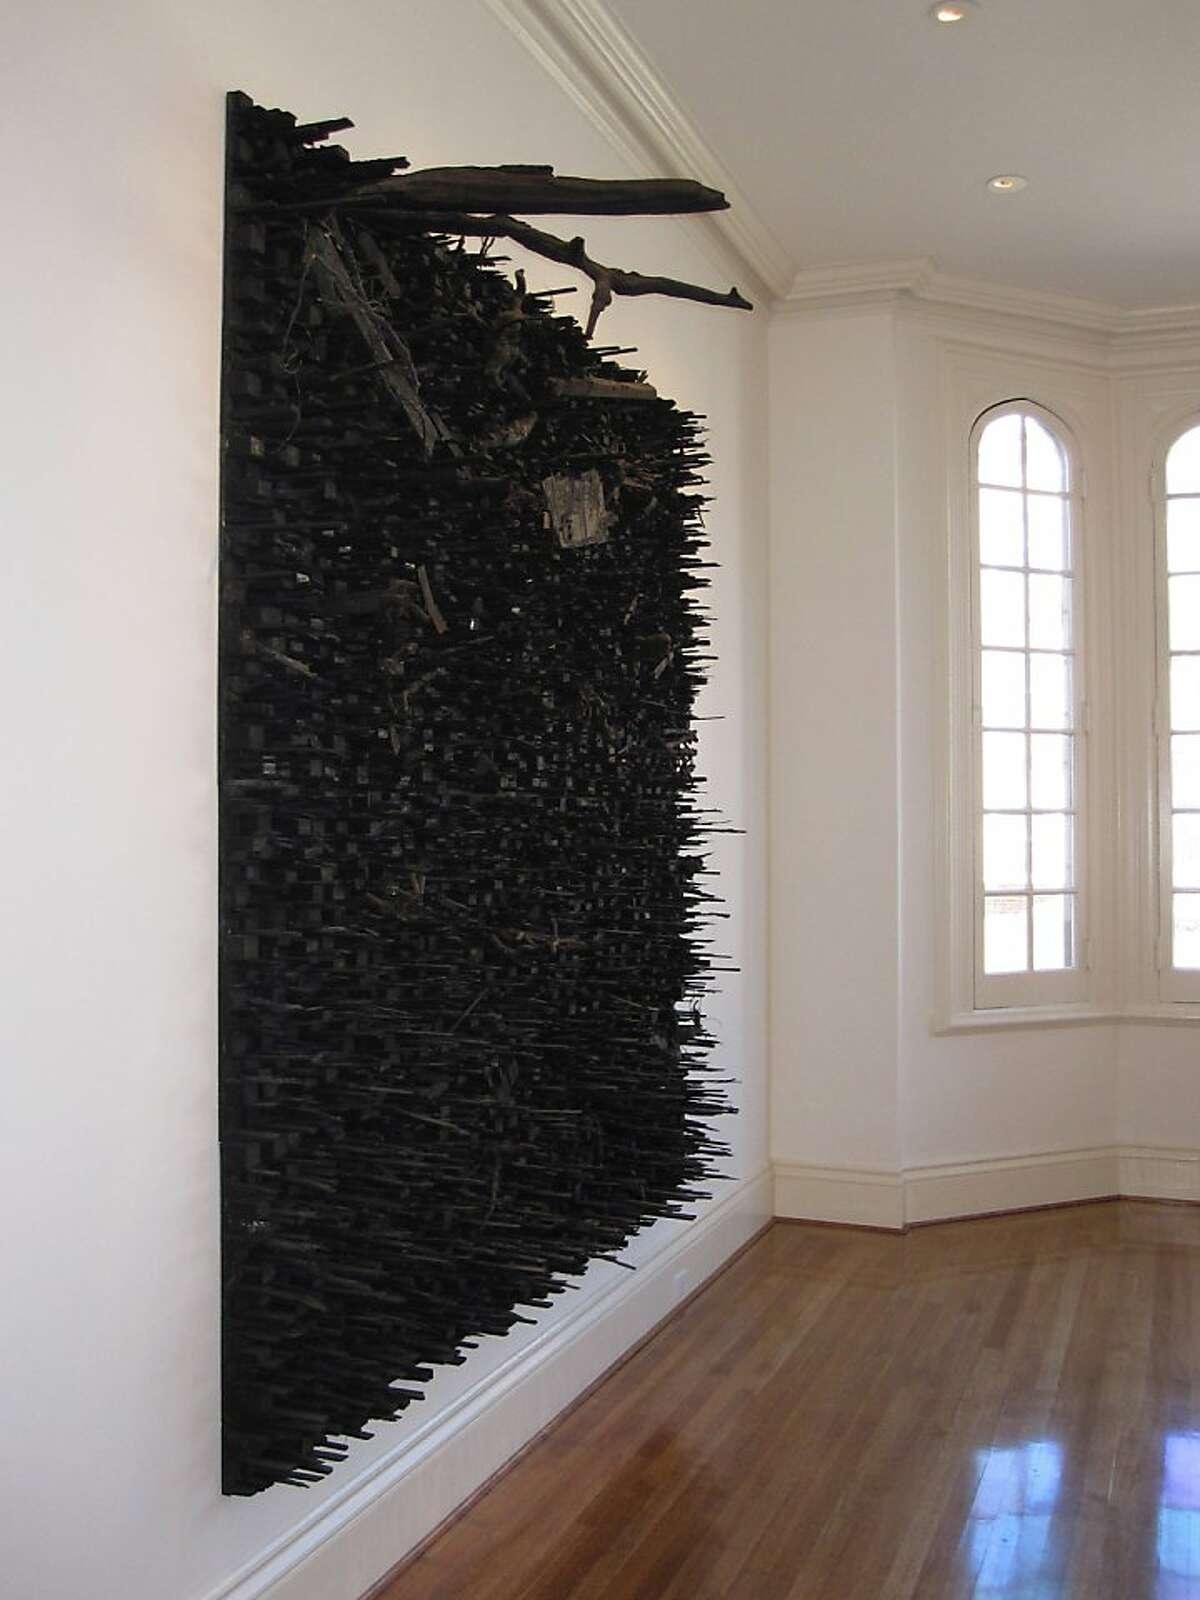 """Number 13S"" (2011) wood sculpture by Leonardo Drew 96"" x 96"" x 14"""